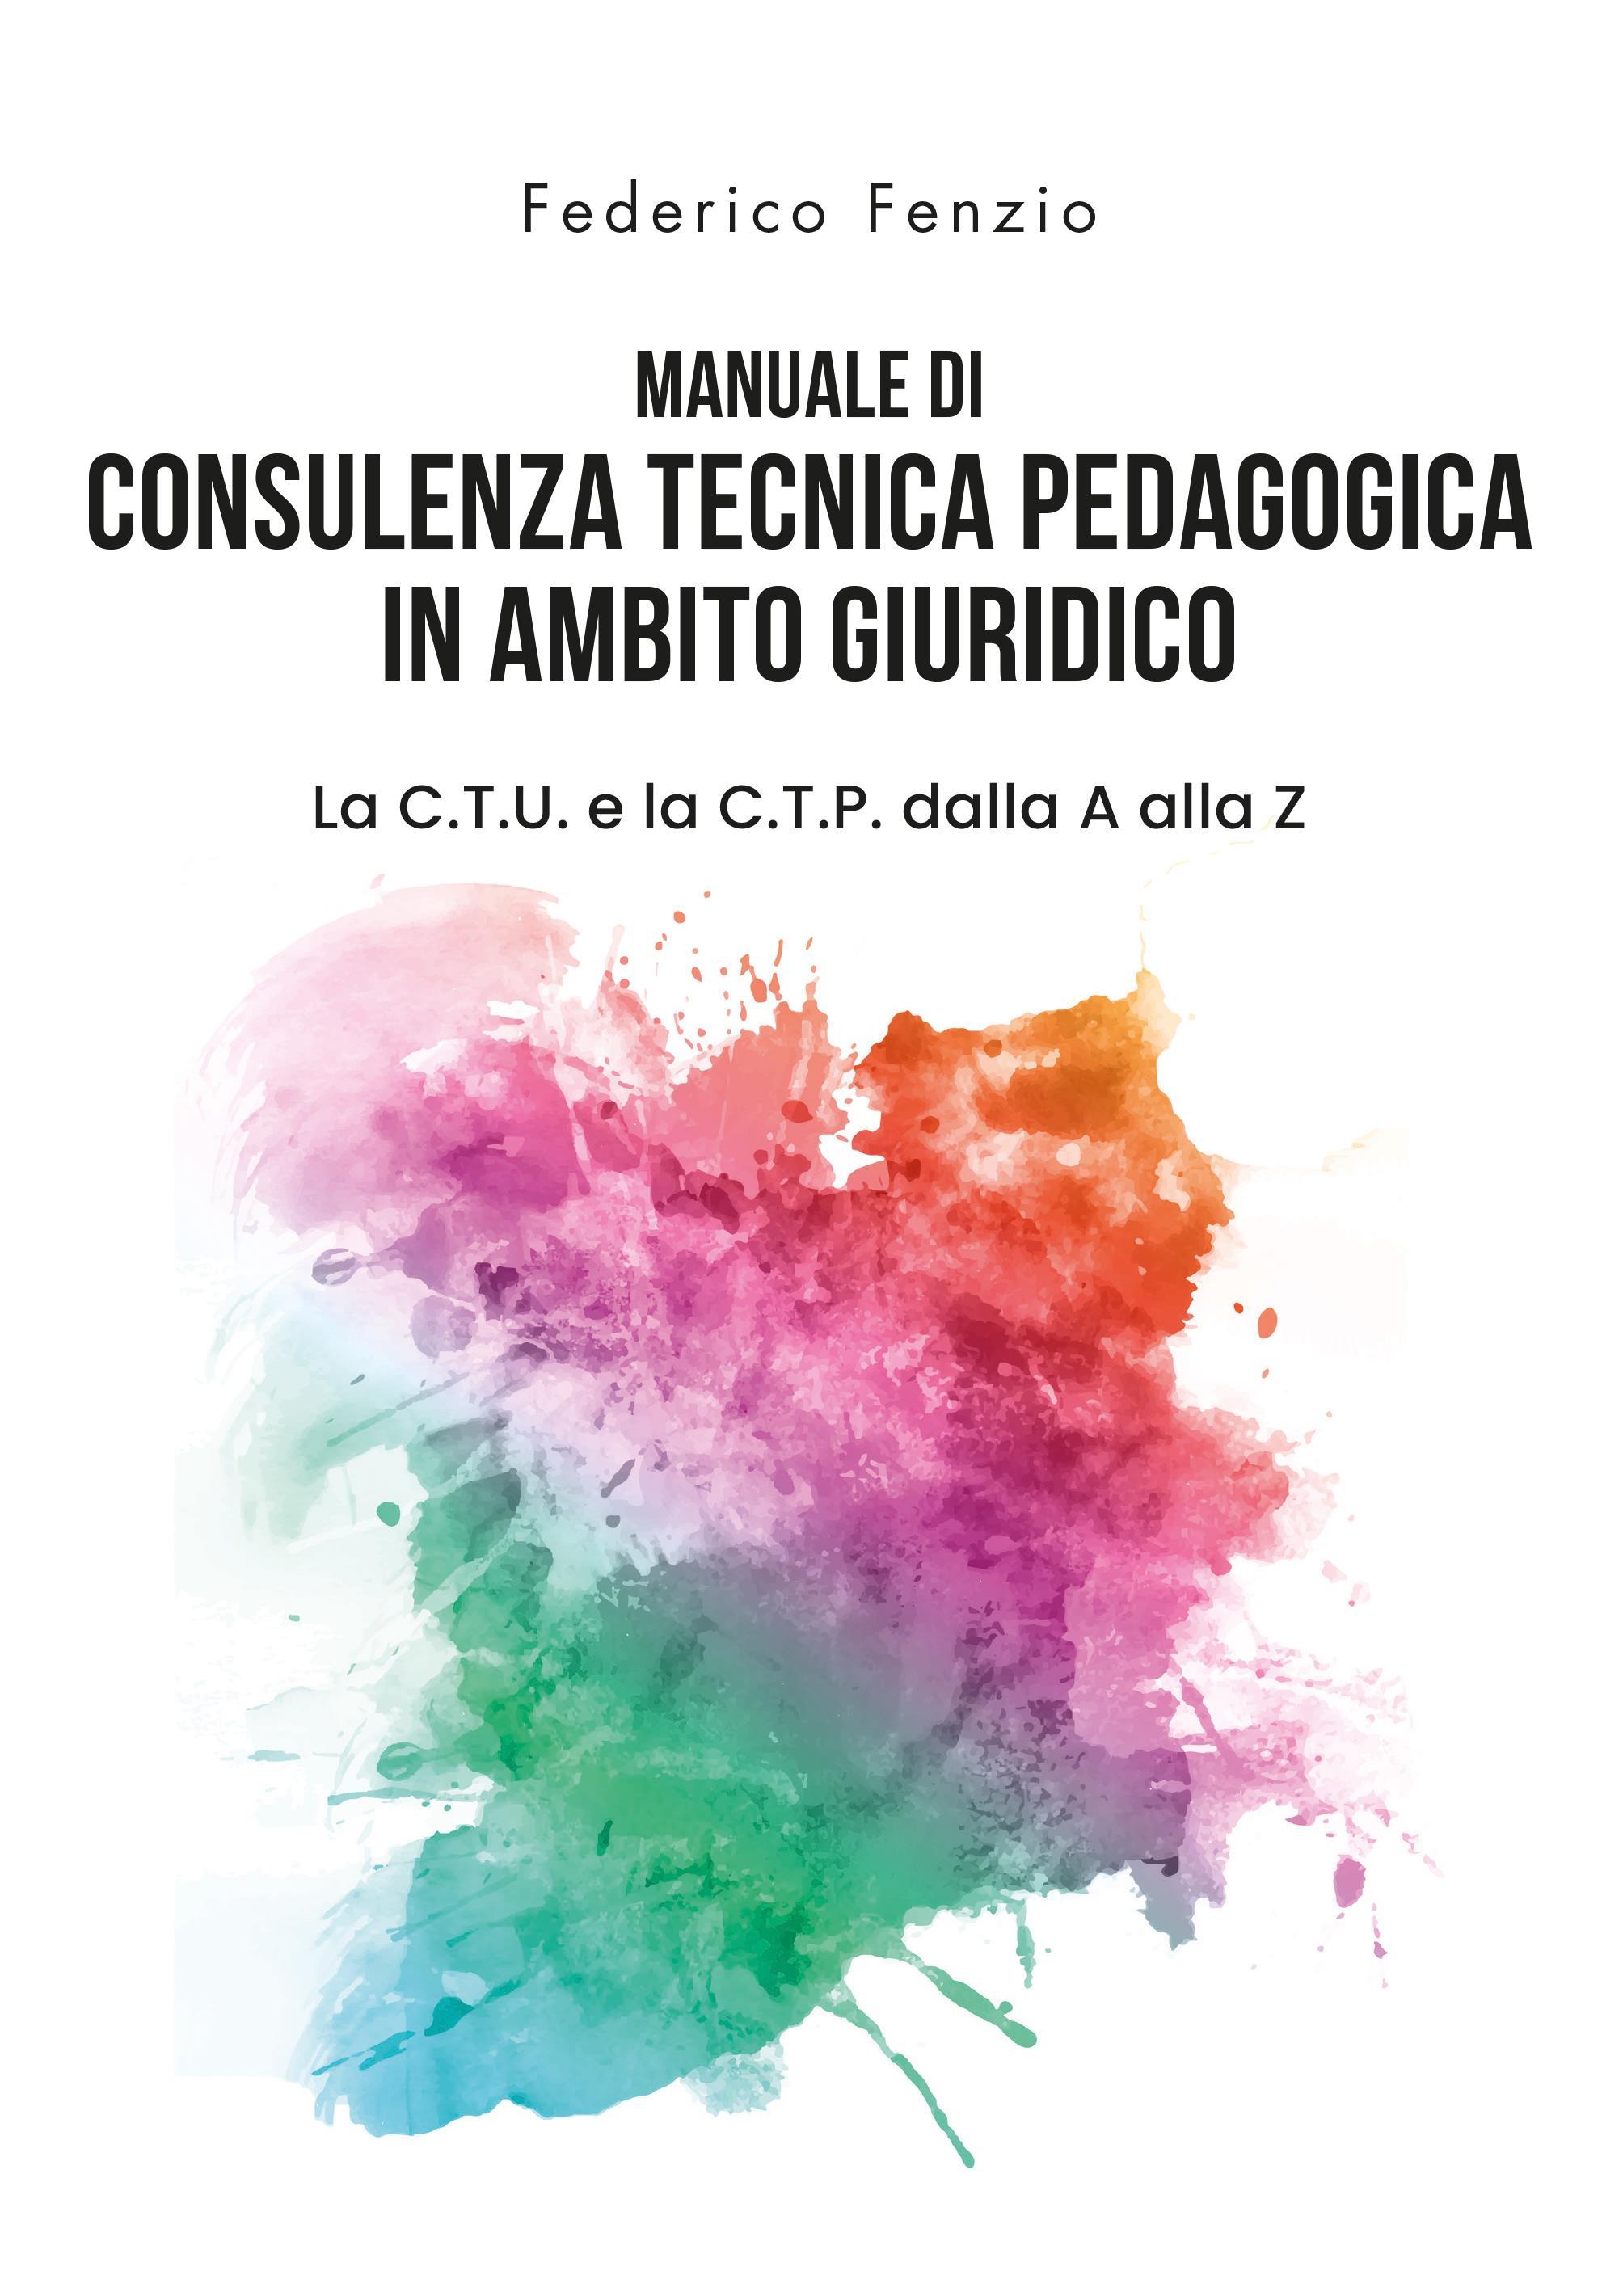 Manuale di consulenza tecnica pedagogica in ambito giuridico. La C.T.U. e la C.T.P. dalla A alla Z